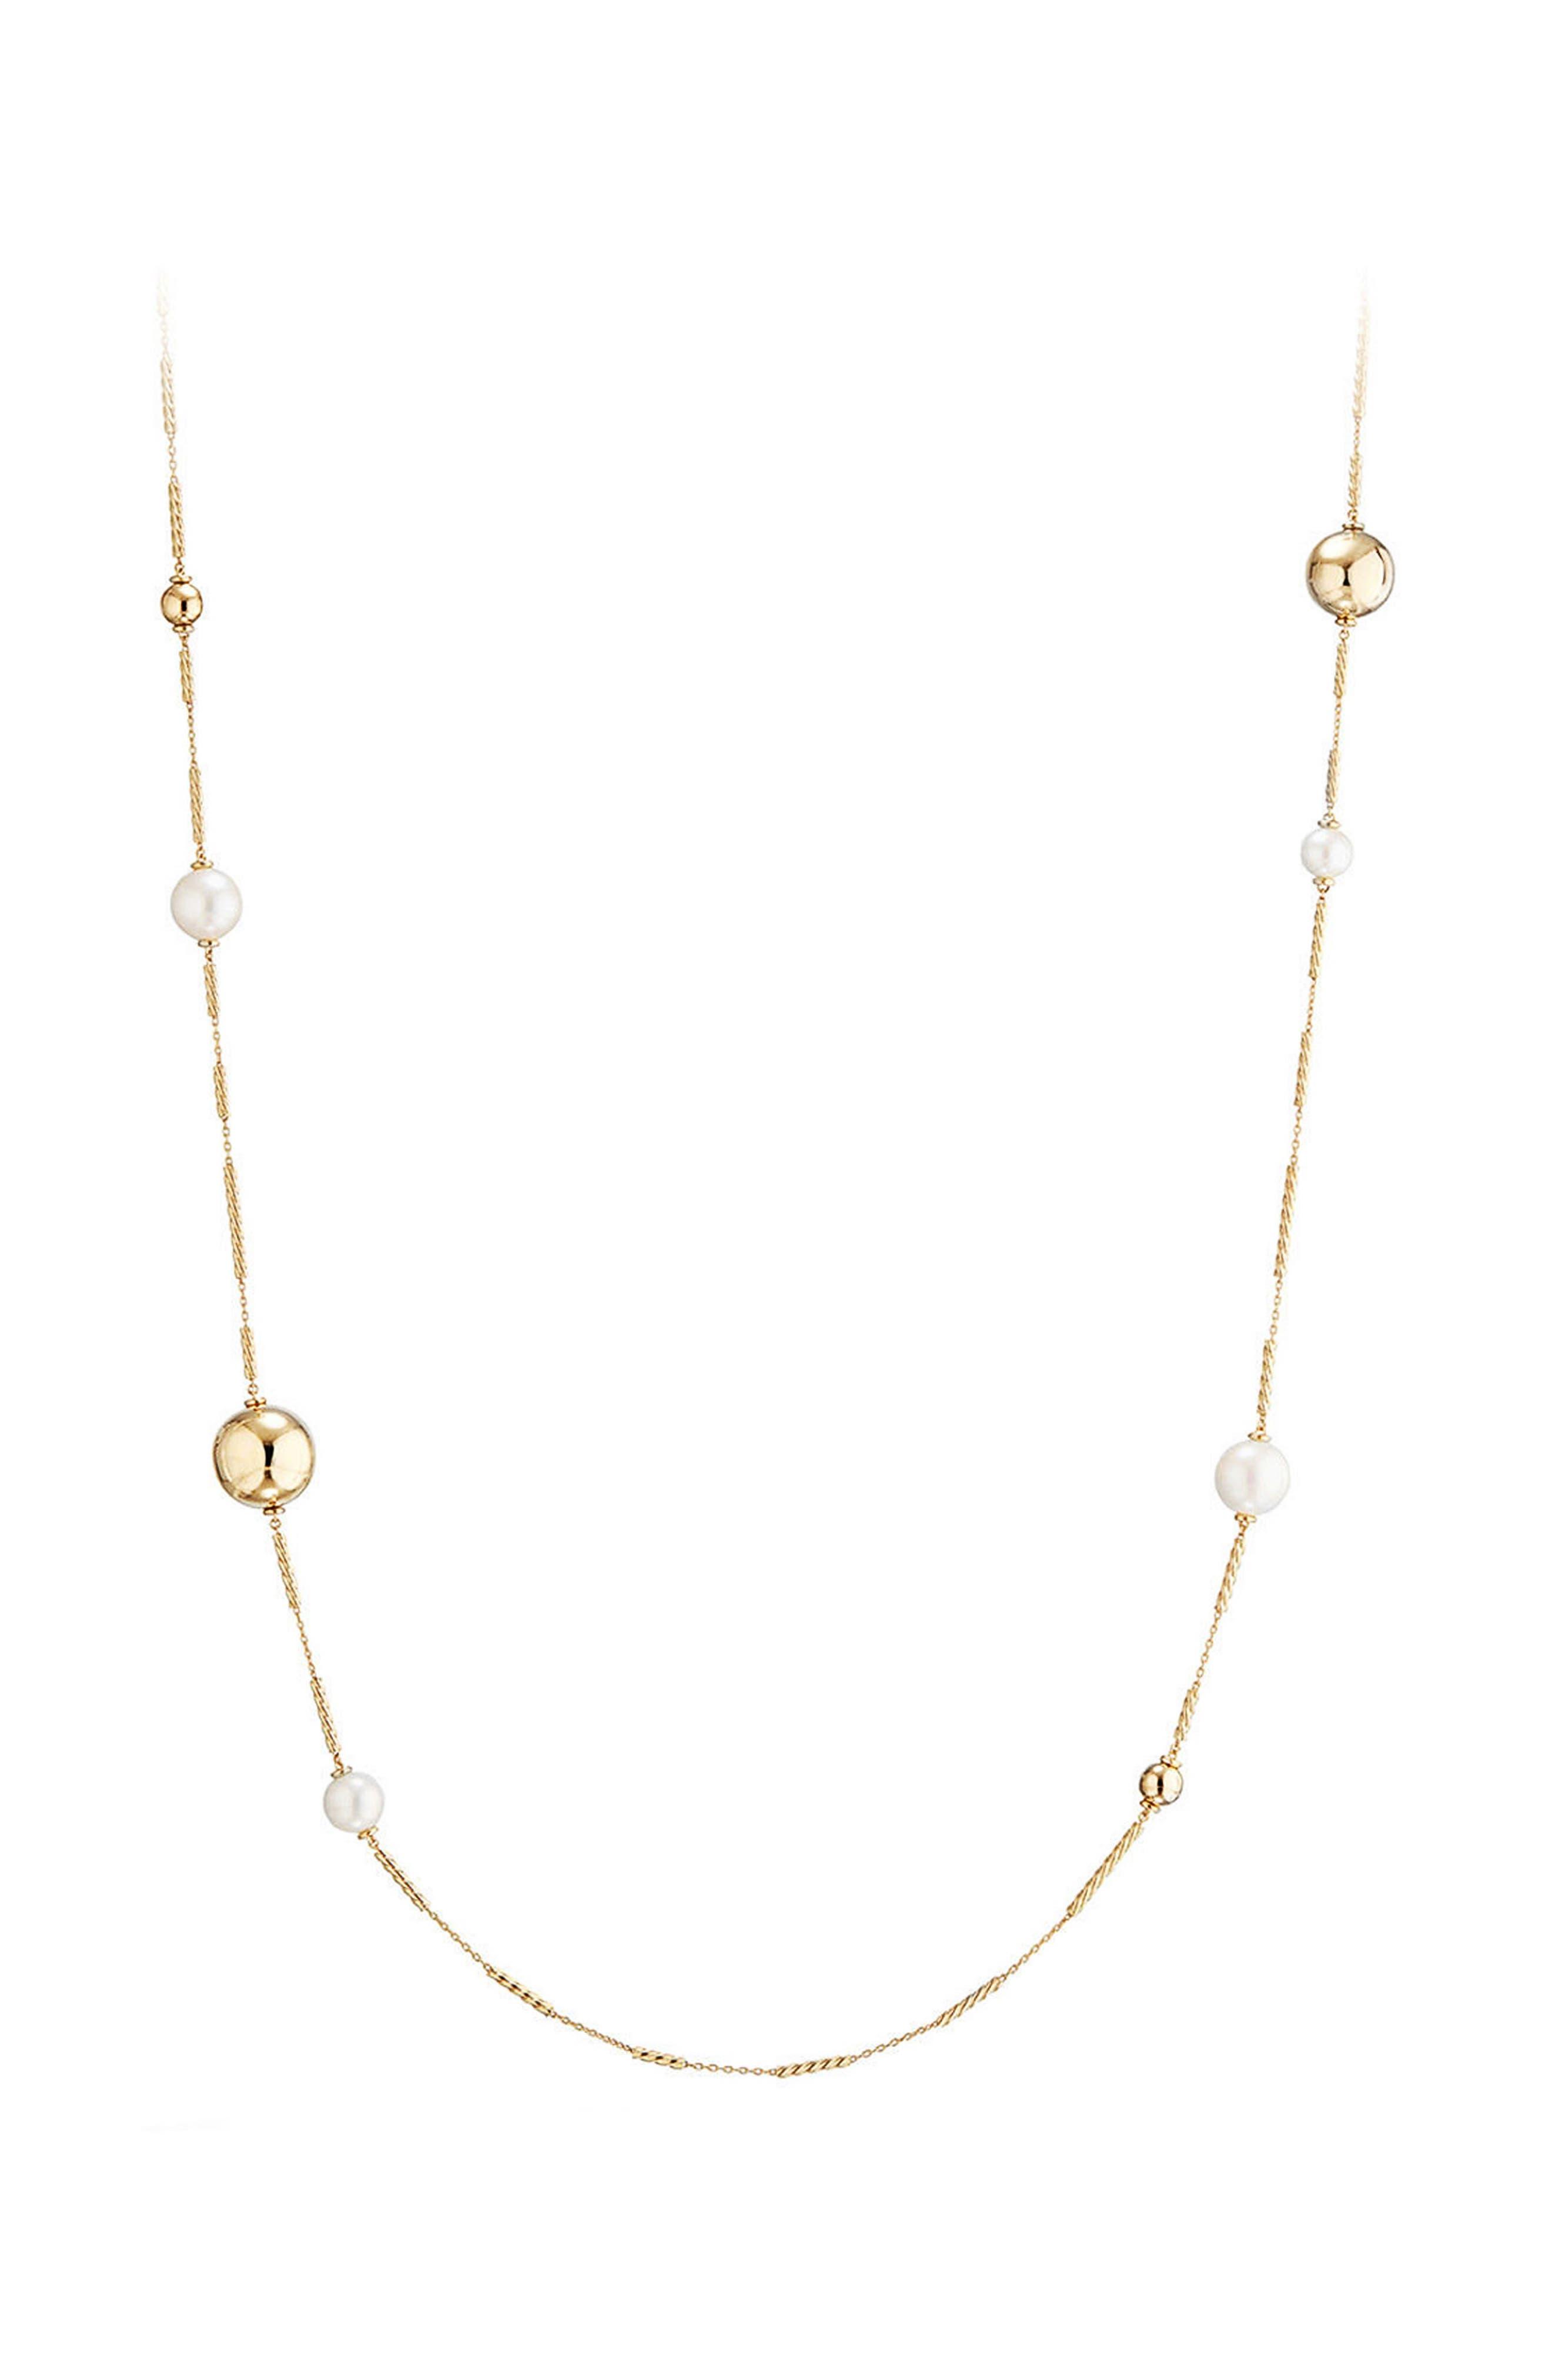 Main Image - David Yurman Solari Long Station Necklace with Pearls in 18K Gold